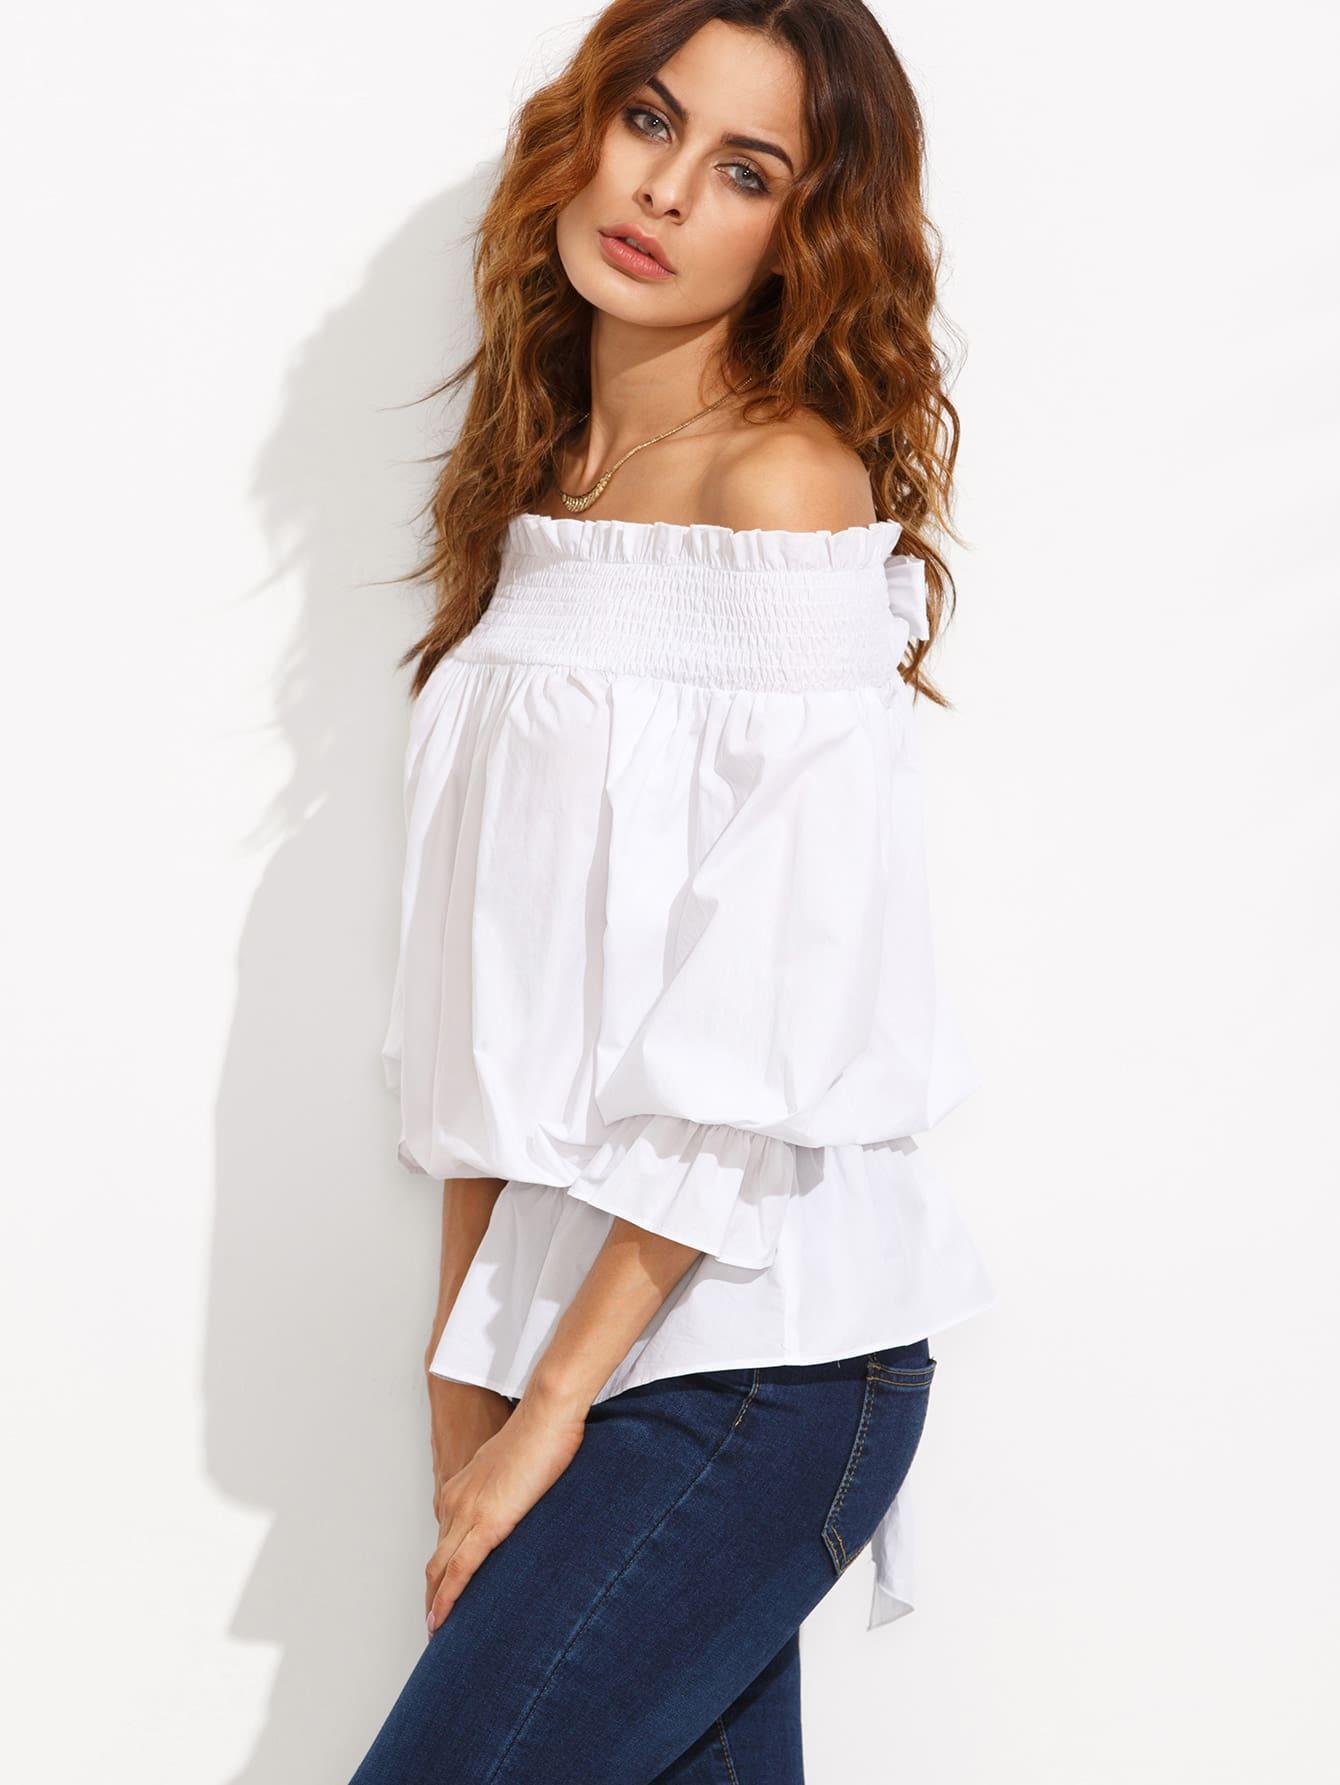 blouse160802504_2